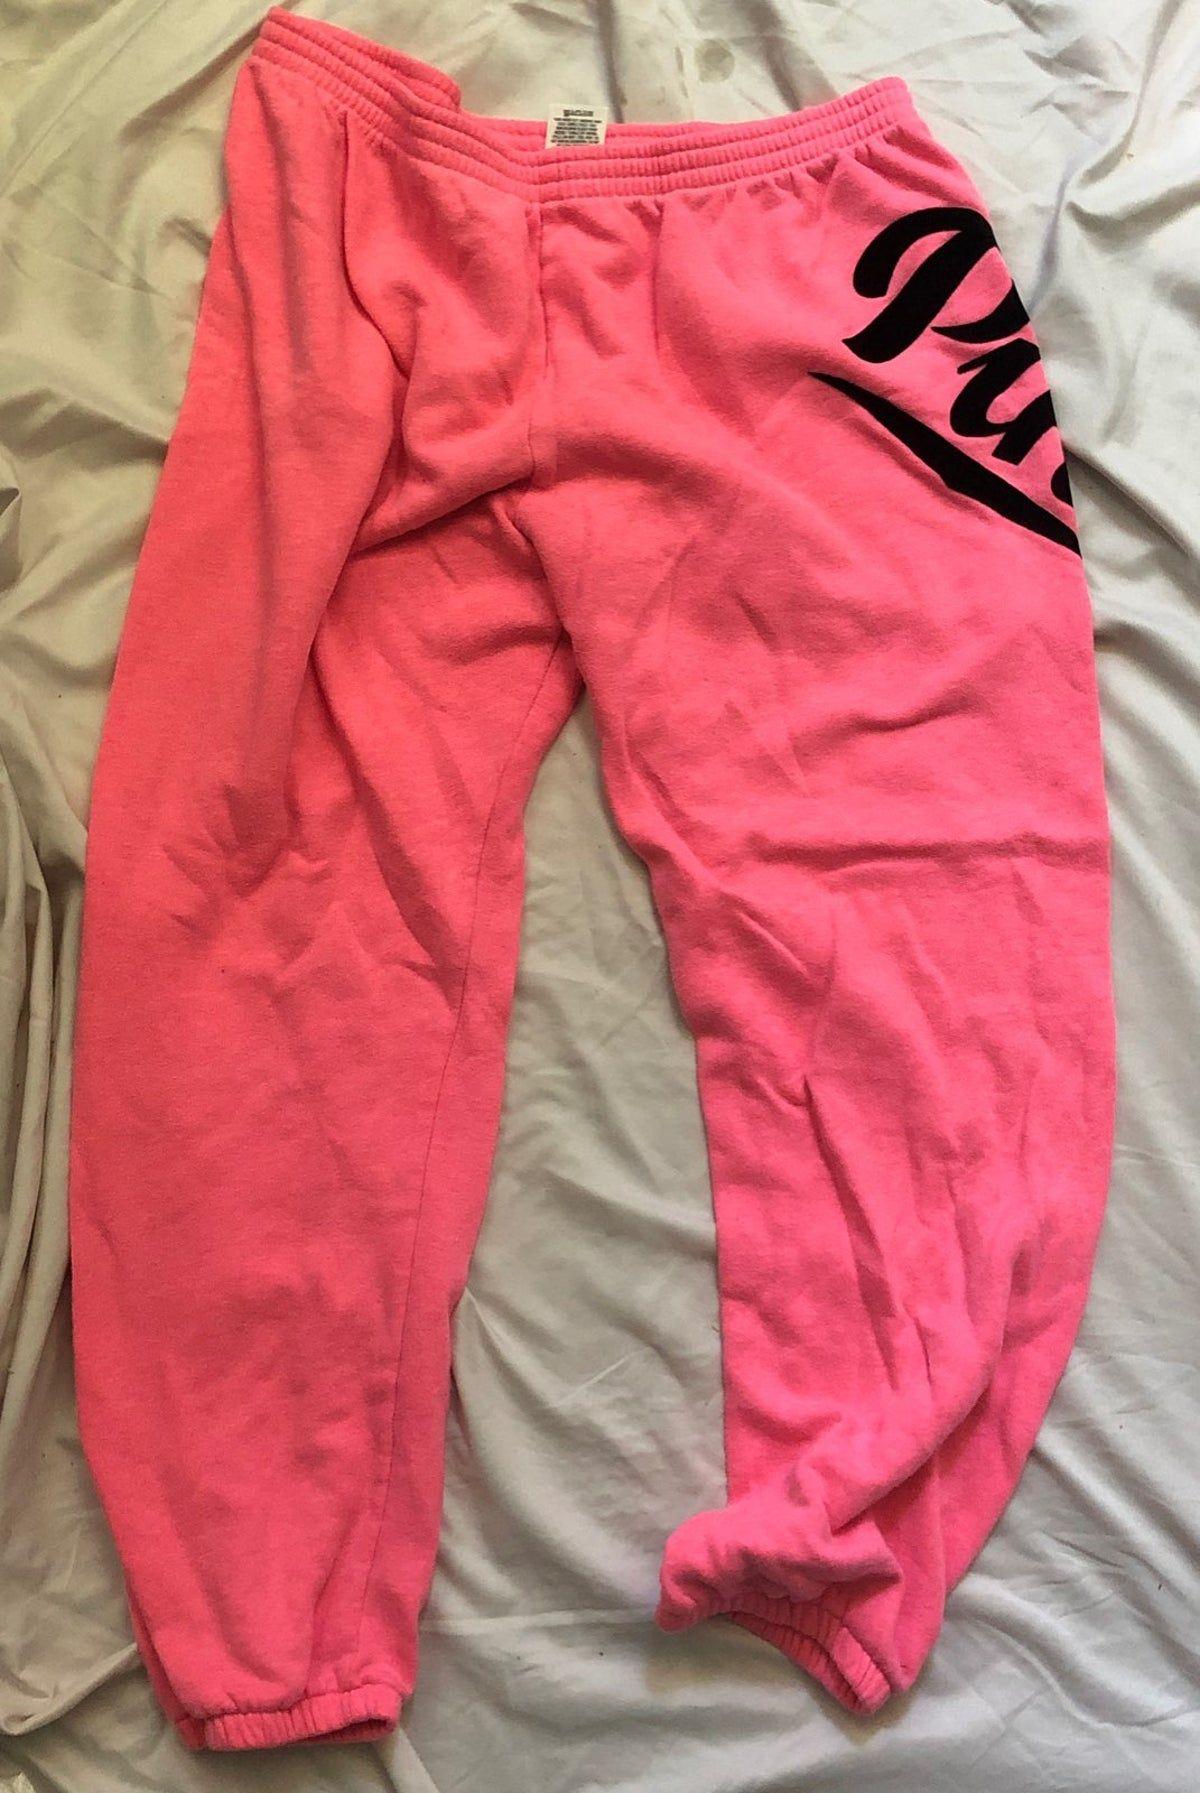 Pink Victoria Secret Sweat Pants Victoria Secret Sweats Pink Victoria Secret Sweats Victoria Secret Pink